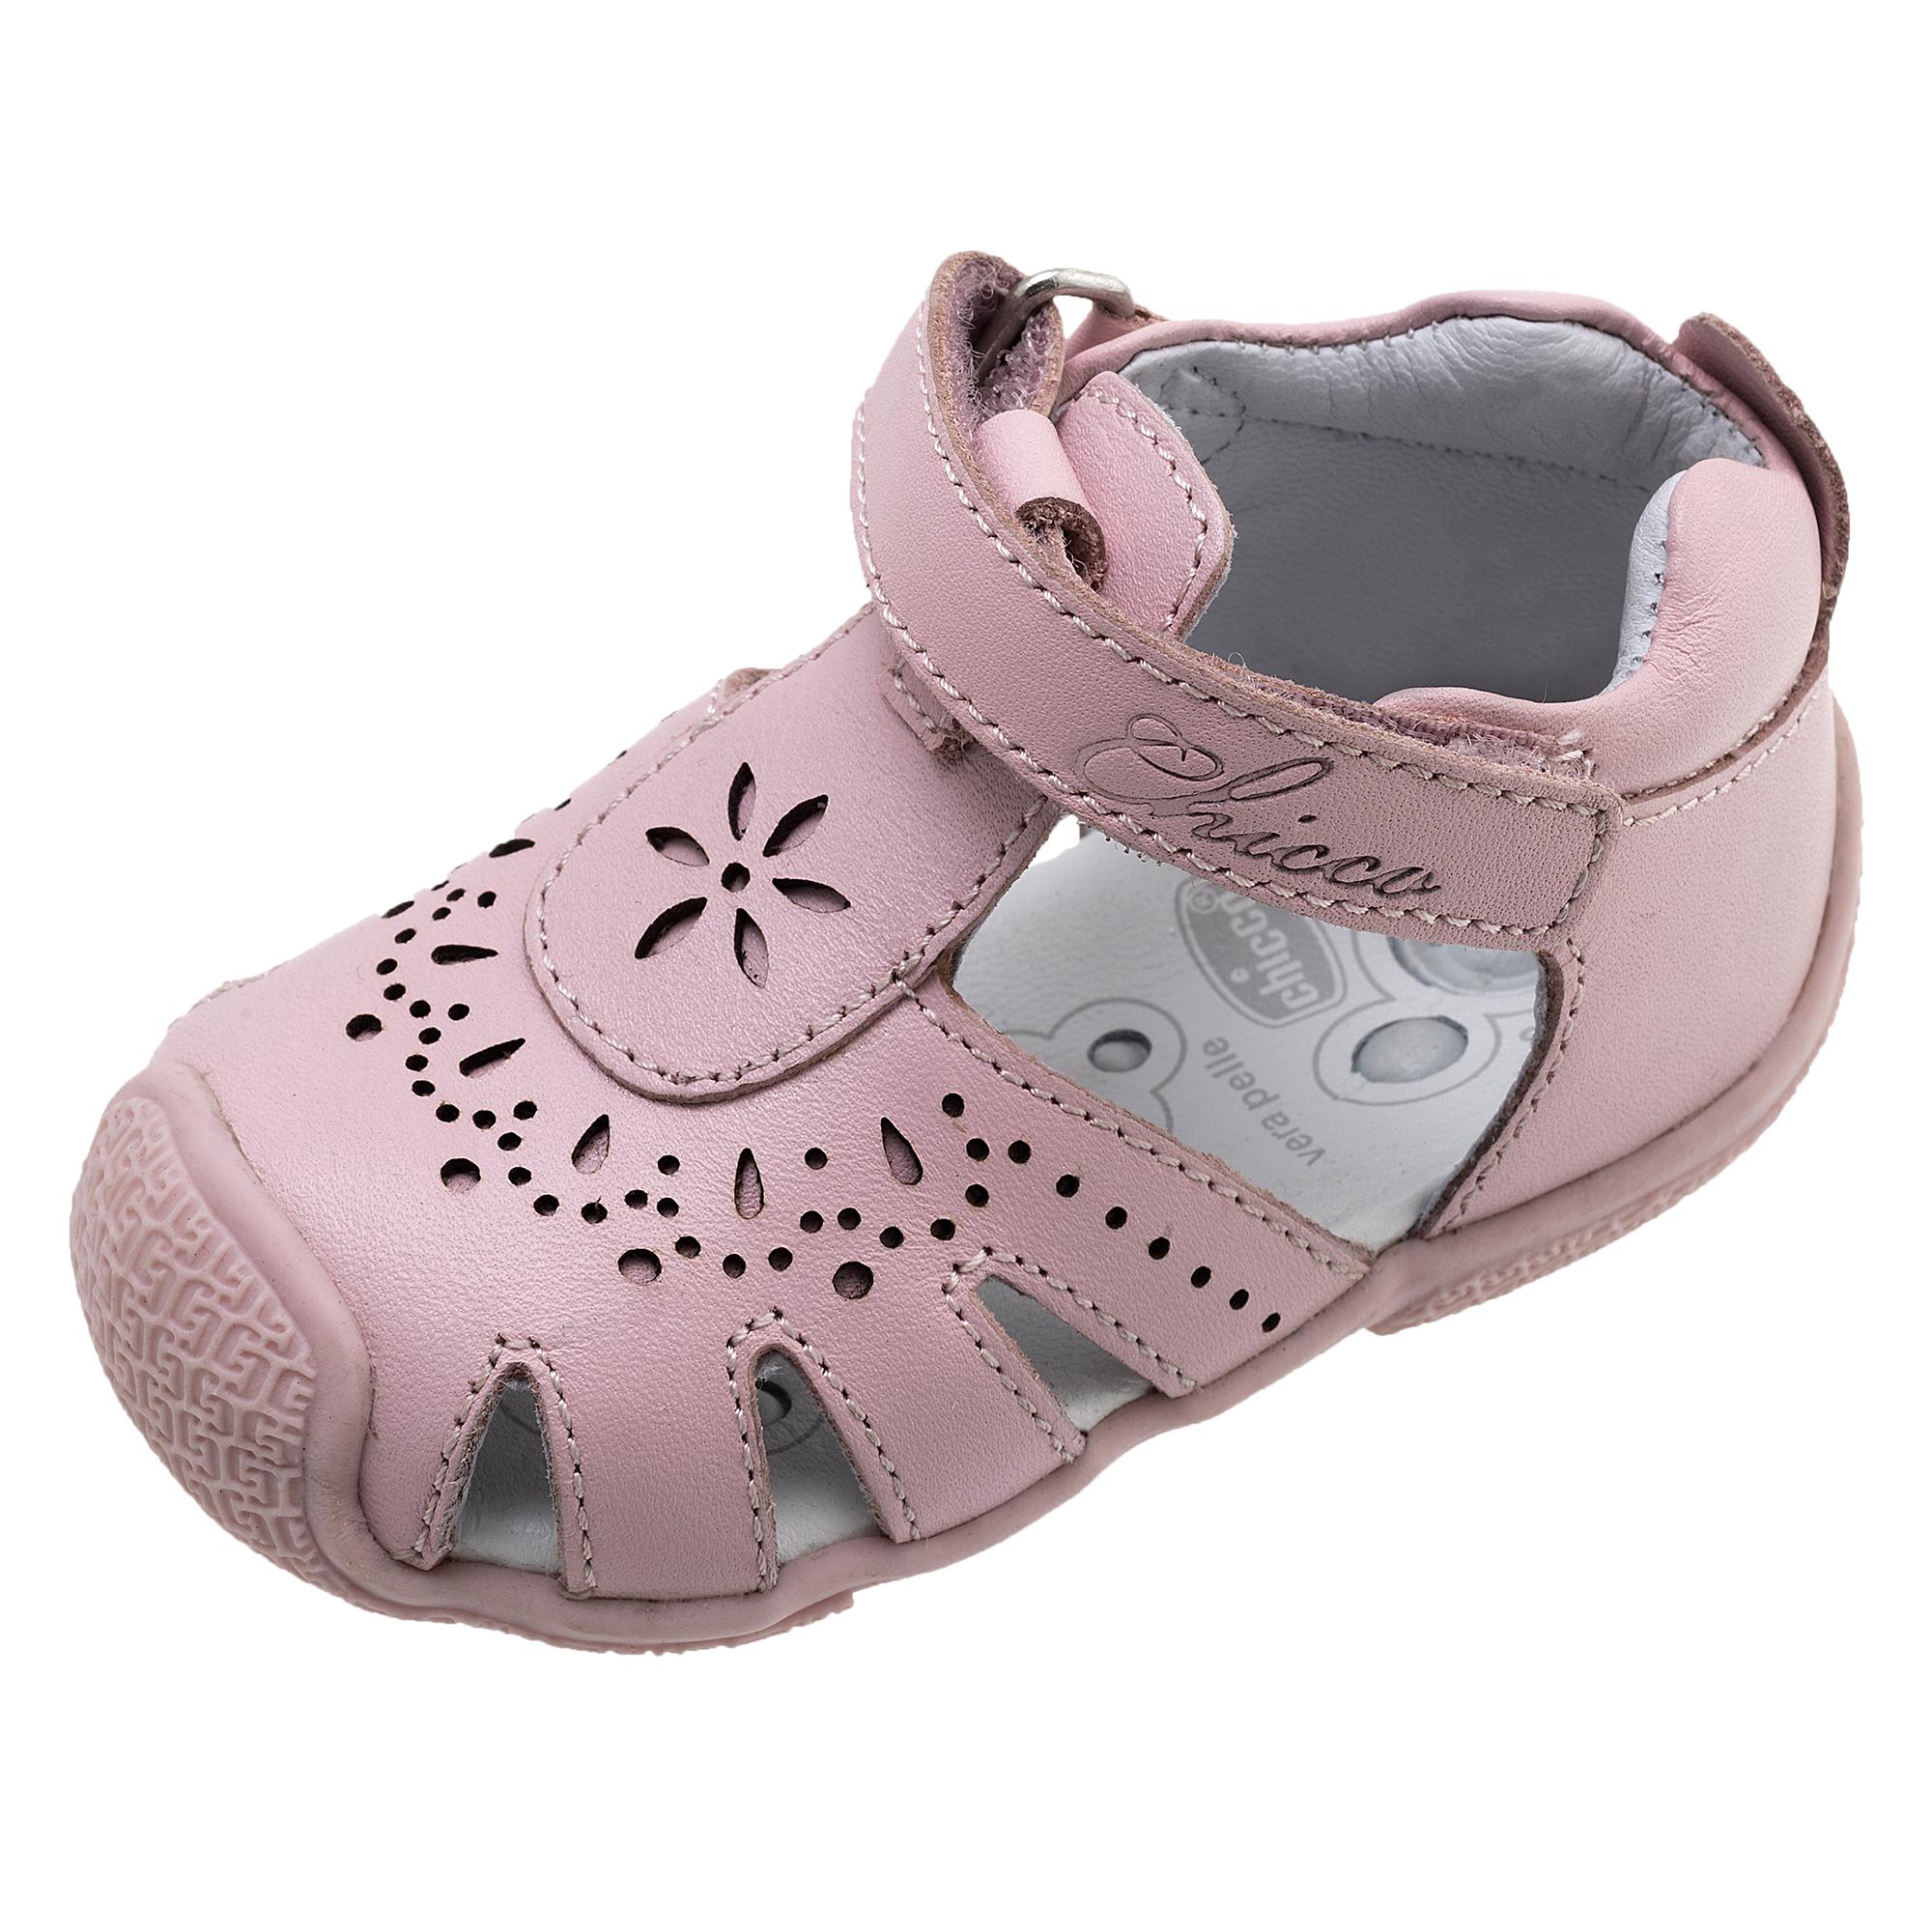 Sandale Copii Chicco Giorgia, Roz, 61472 imagine